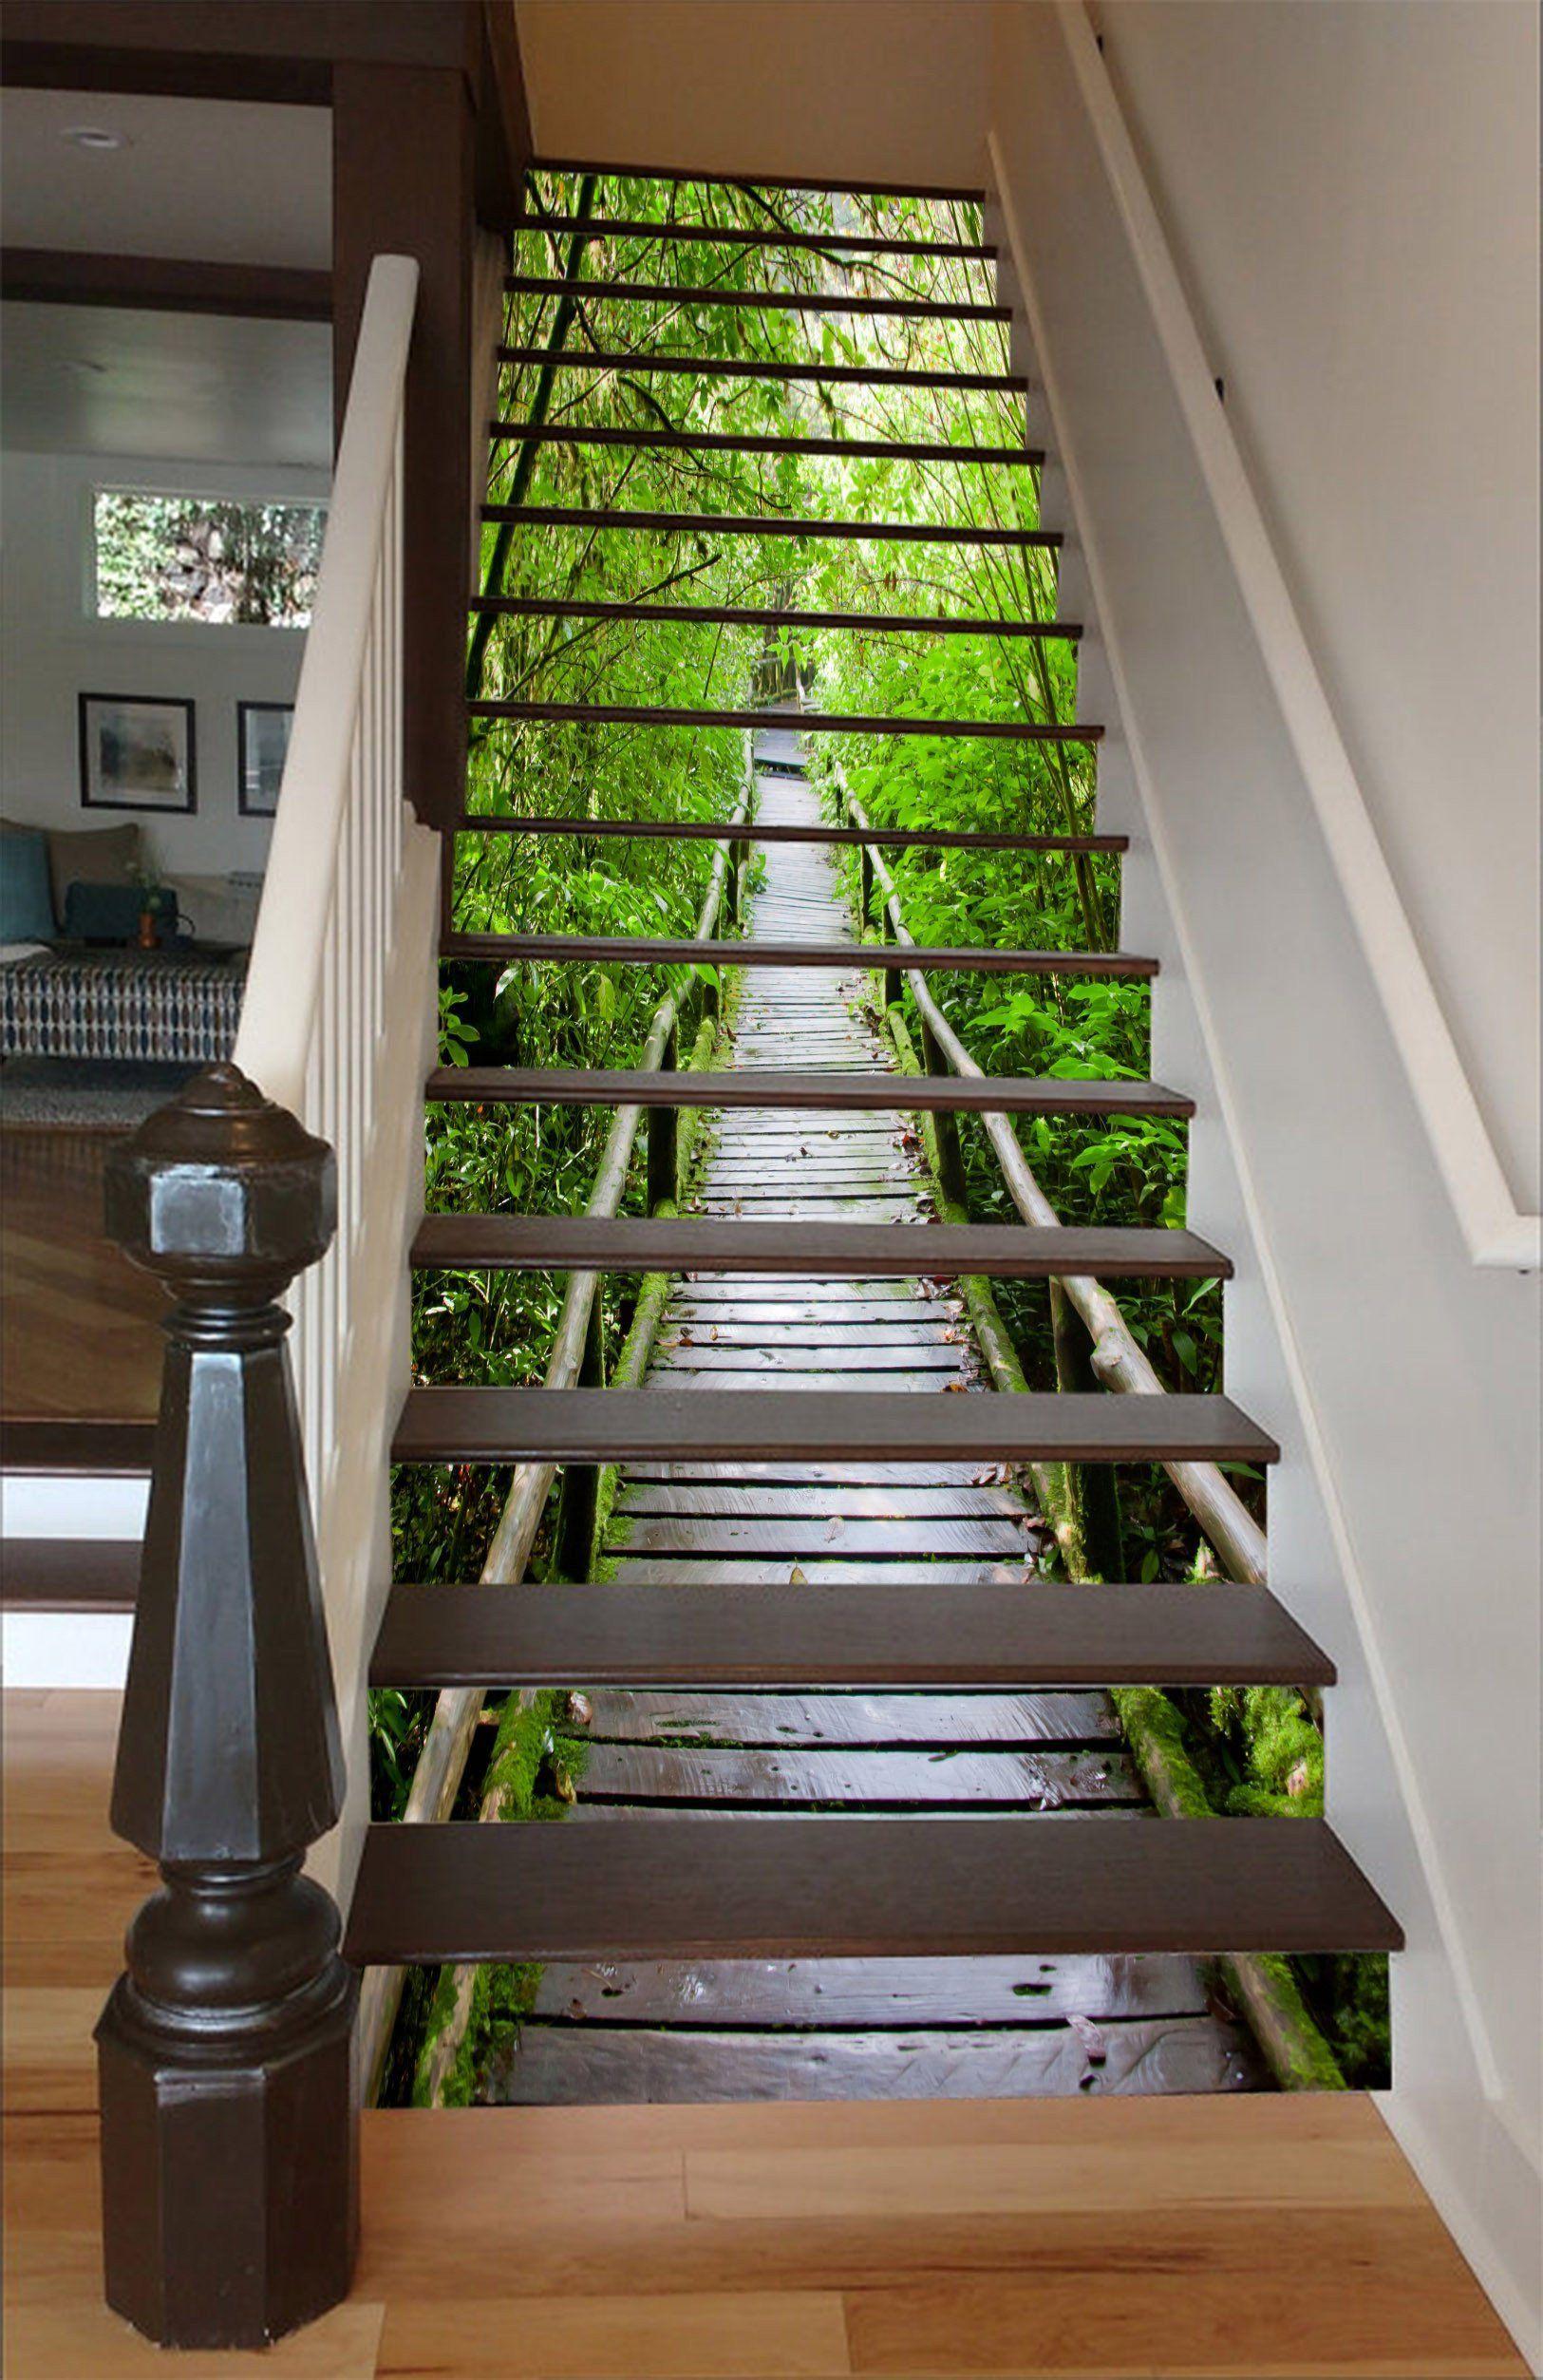 3d Wood Bridge Green Trees 1535 Stair Risers Stair Decor Door Murals Beautiful Stairs